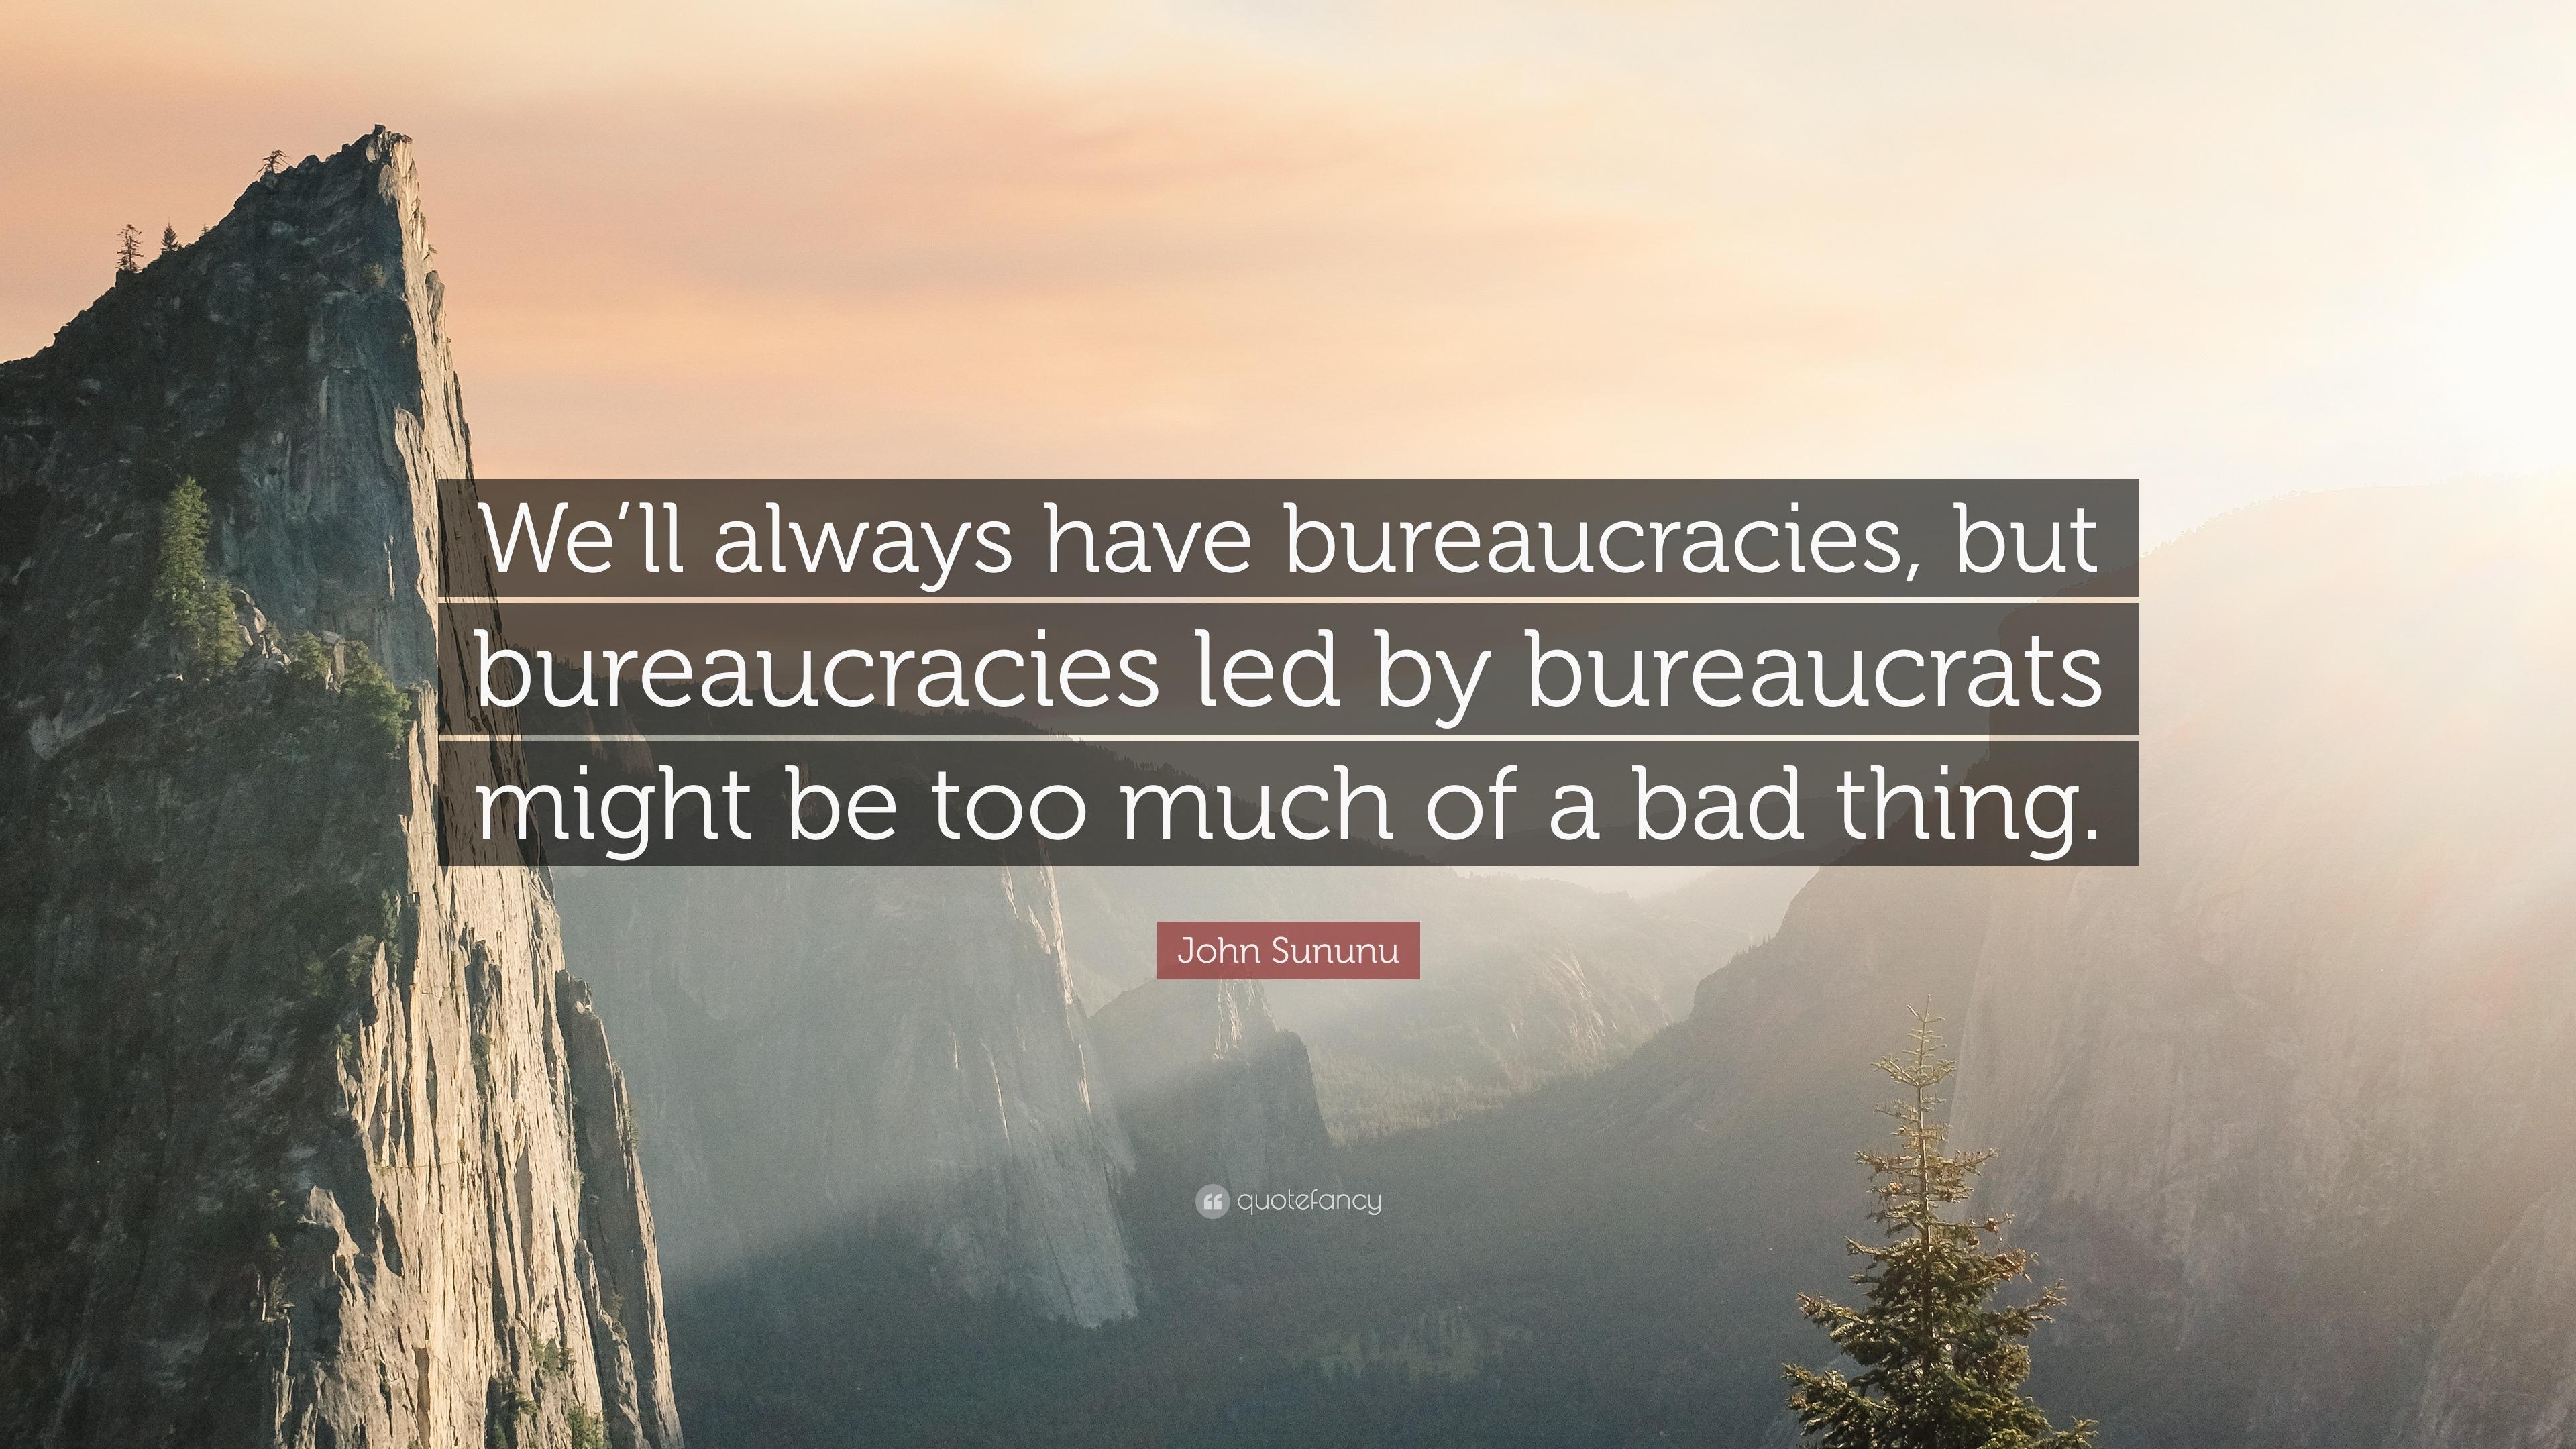 John sununu quote u cwe ll always have bureaucracies but